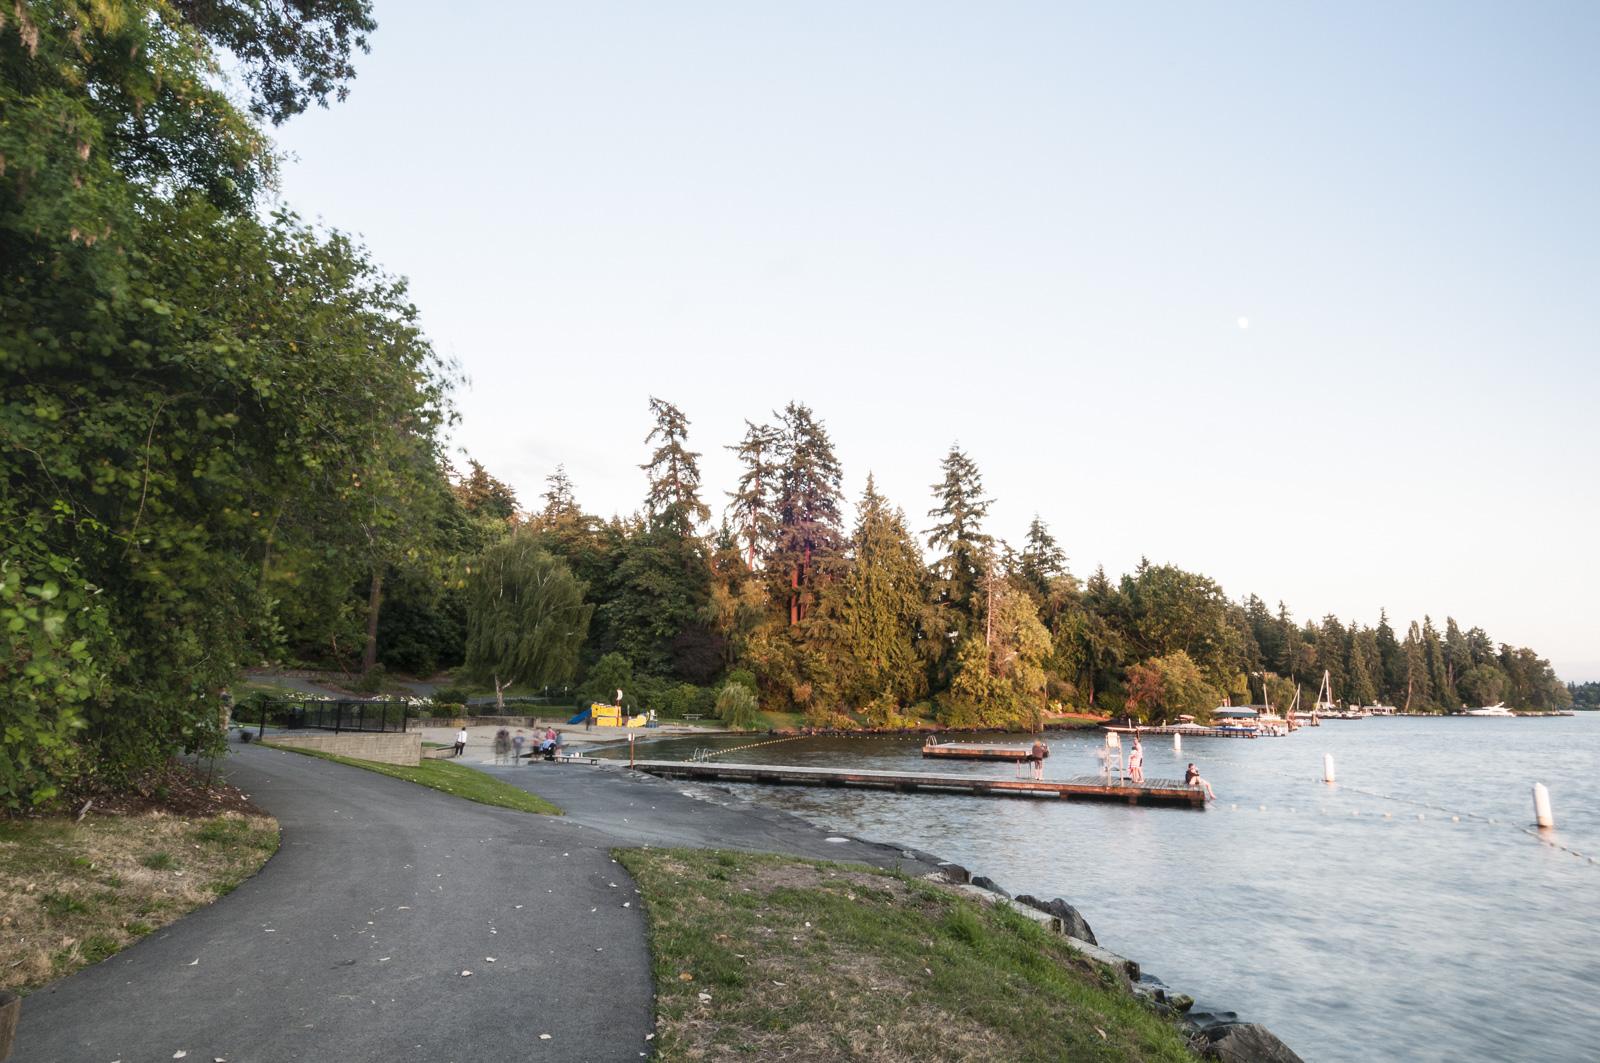 Chism Park, Bellevue, Washington 2016